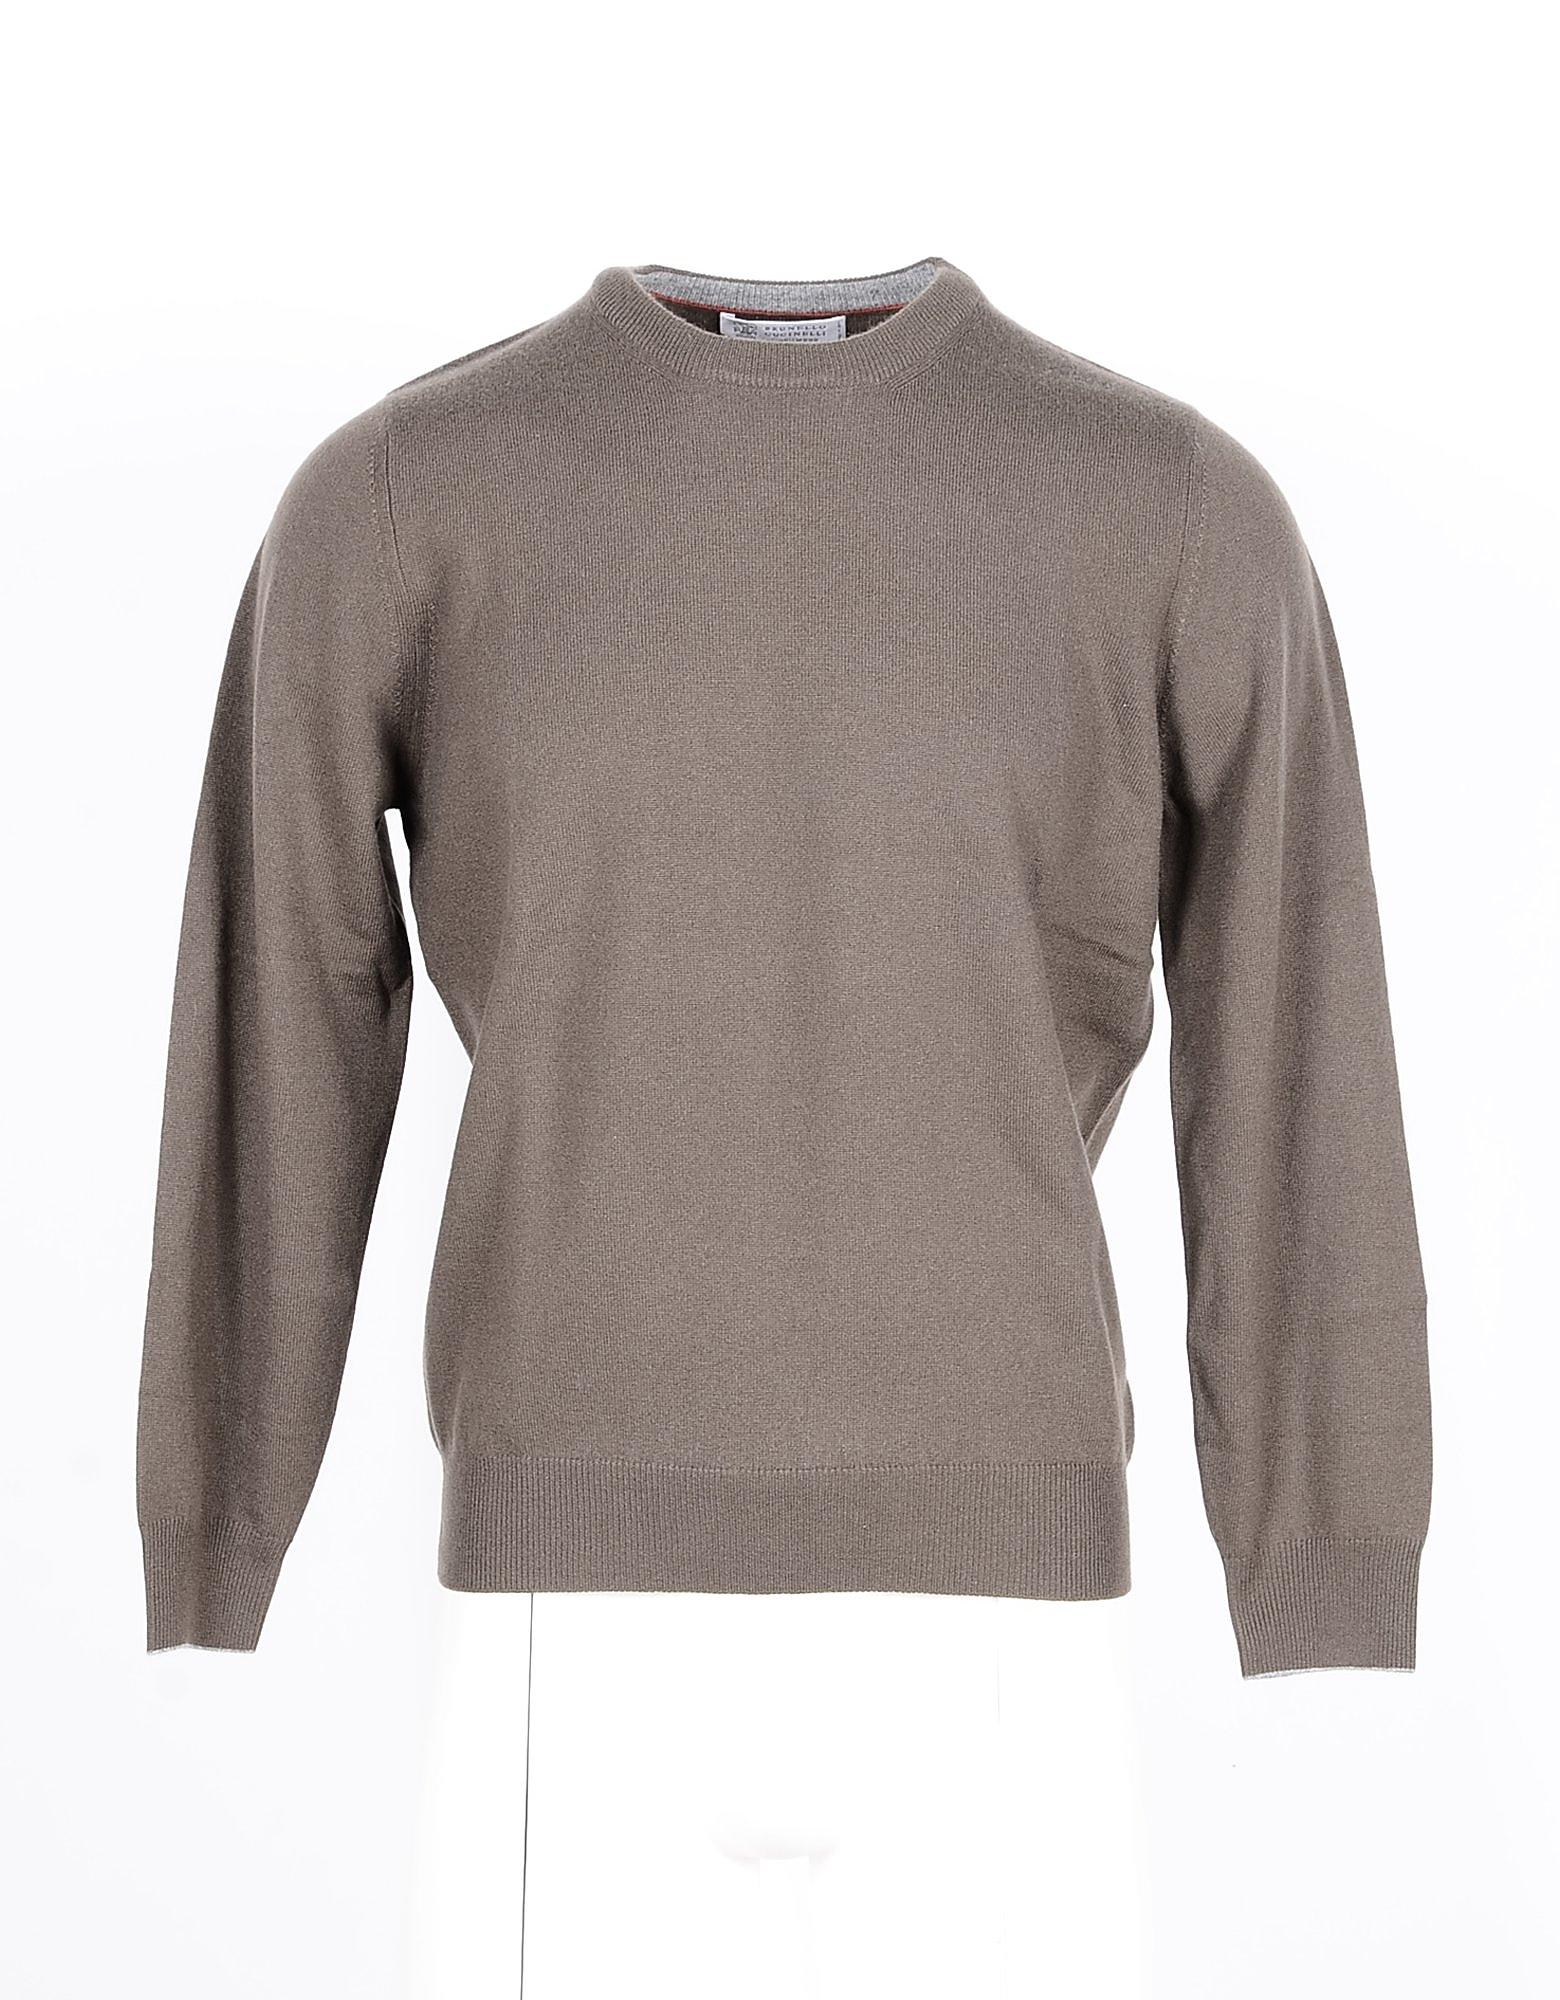 Brunello Cucinelli Designer Knitwear, Taupe Pure Cashmere Men's Sweater